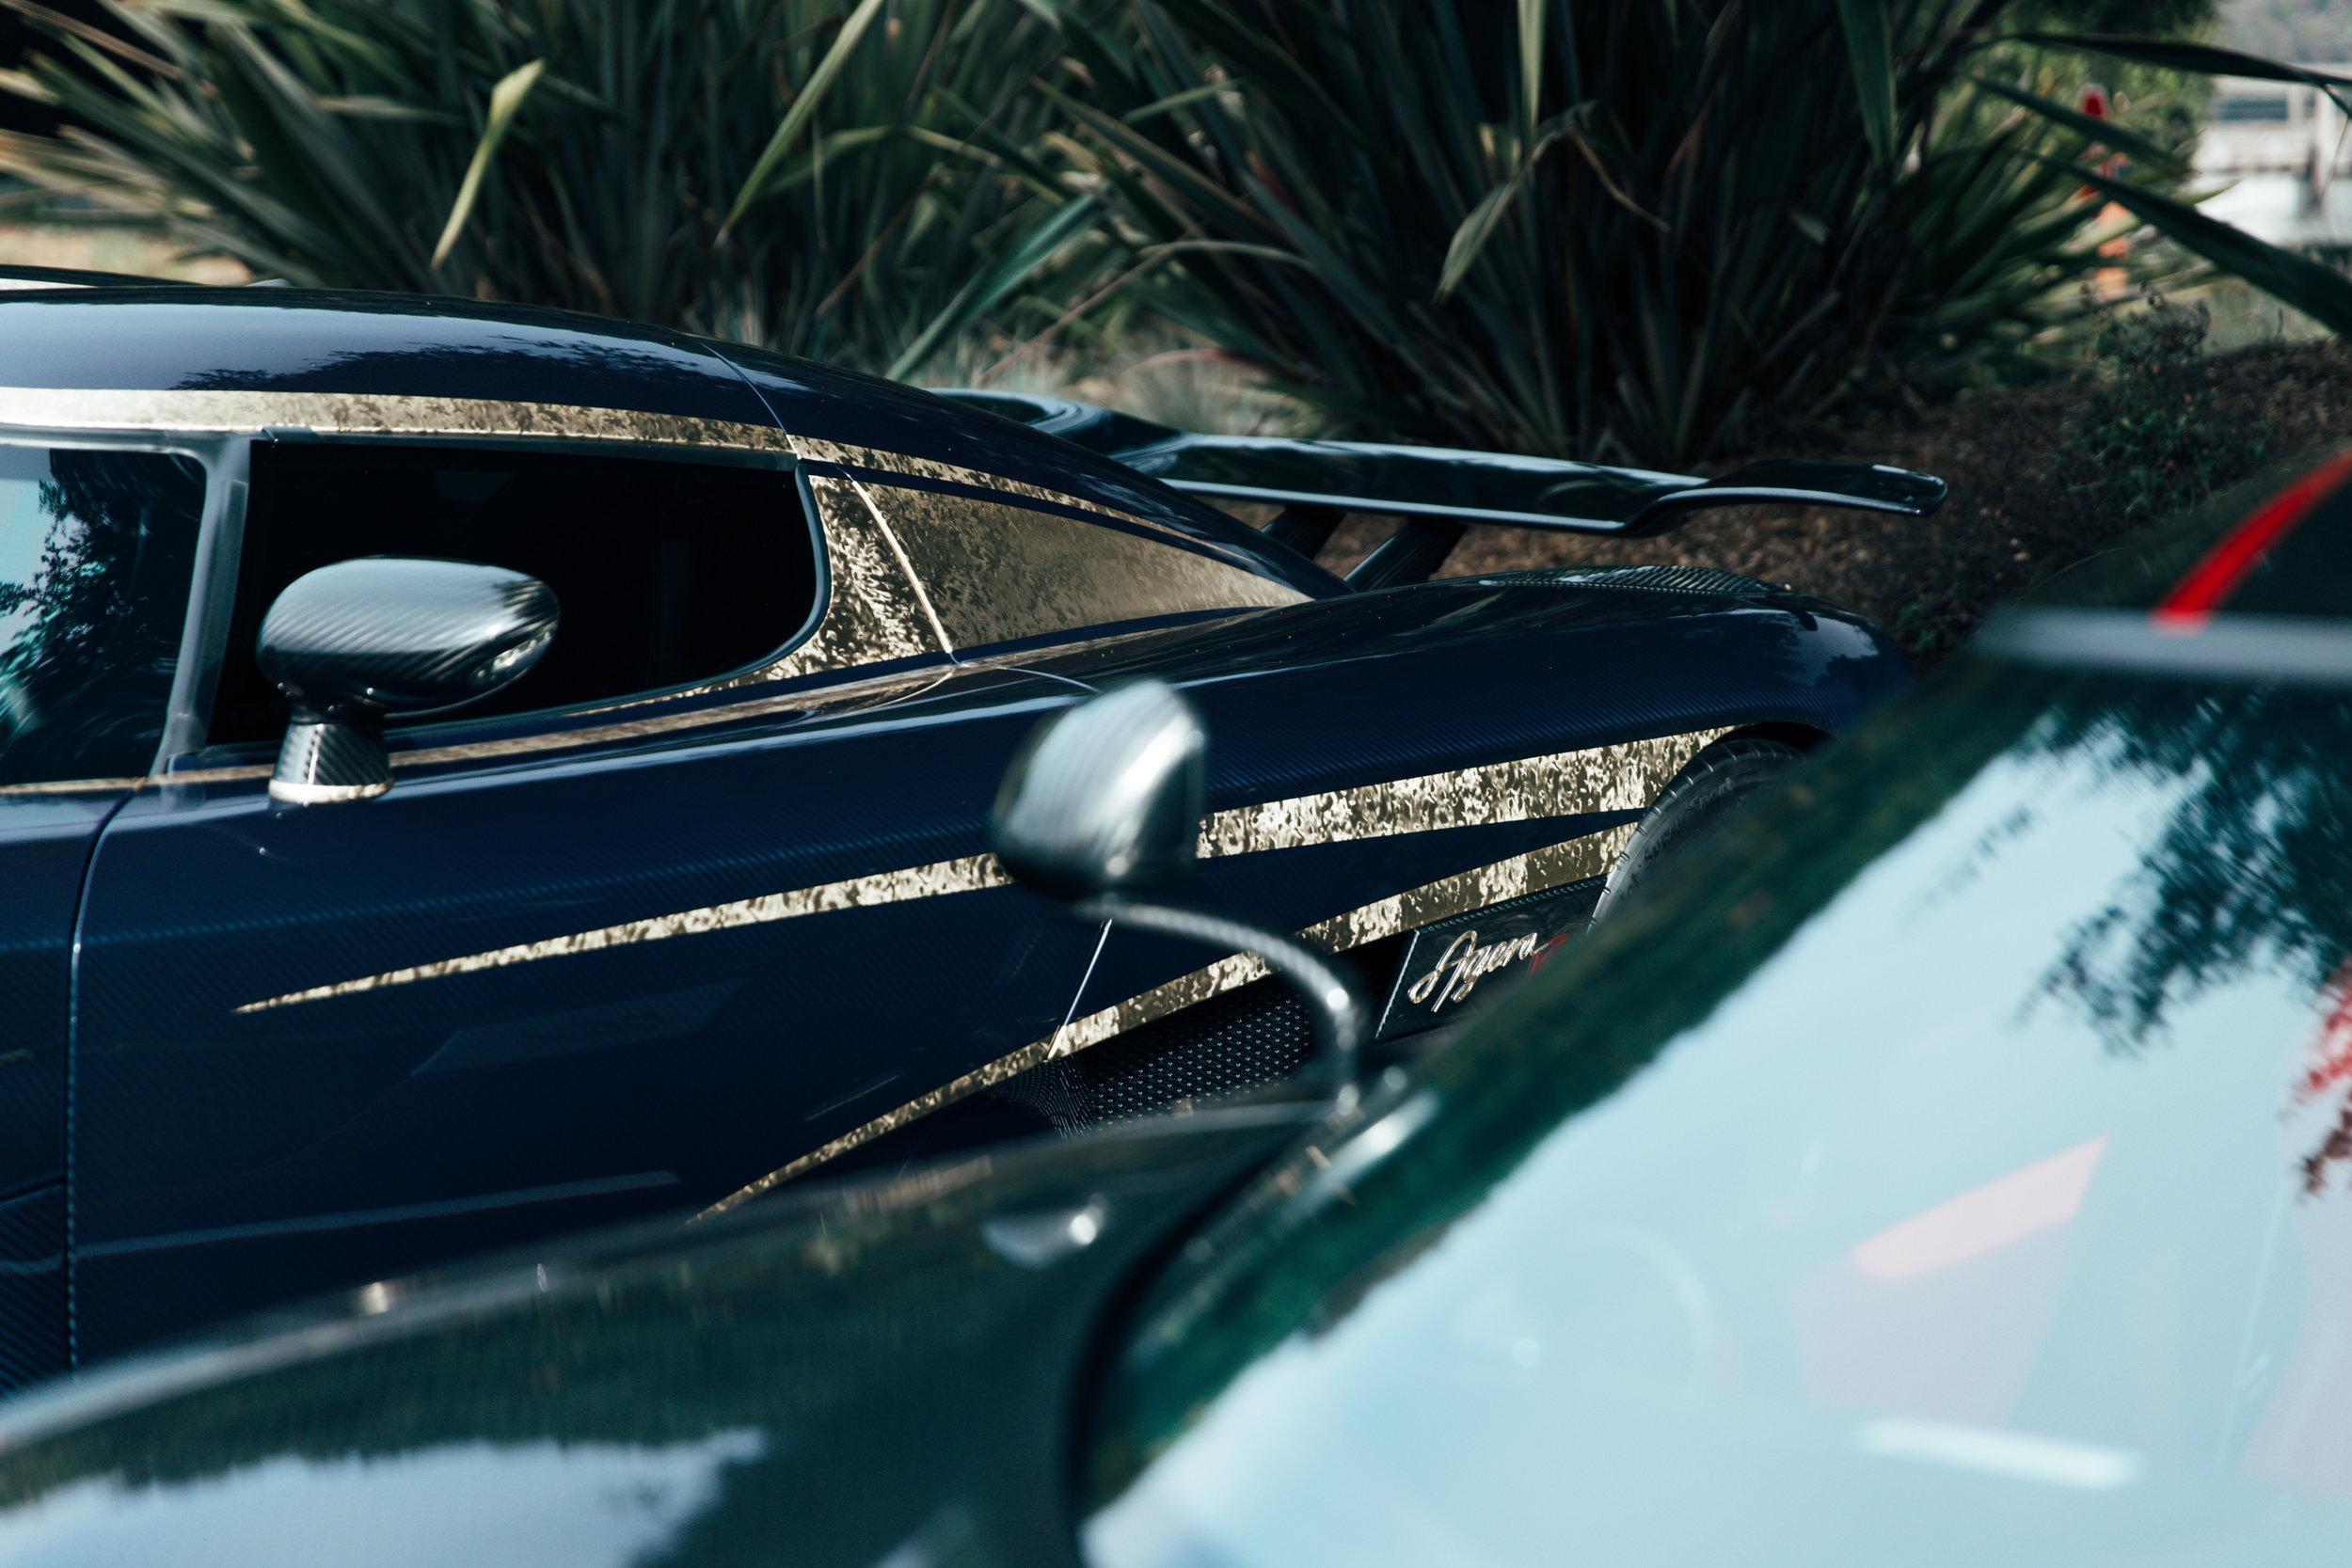 Stay_Driven_Monterey_Car_Week_Koenigsegg-2.jpg